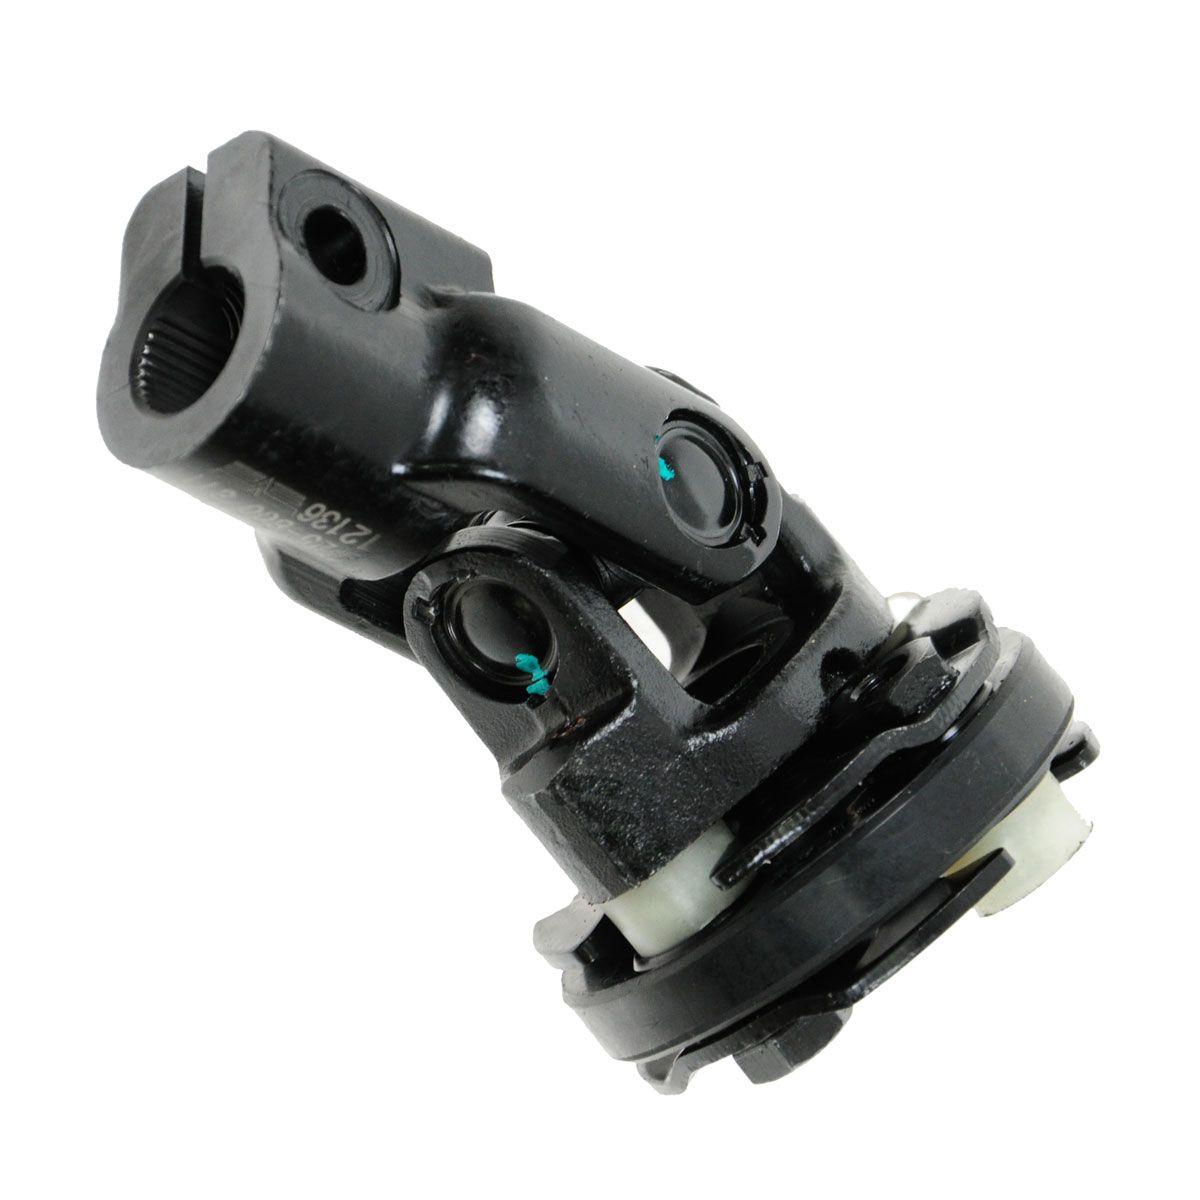 Boat Steering Wheel Coupler : Steering coupler replacement on shoppinder